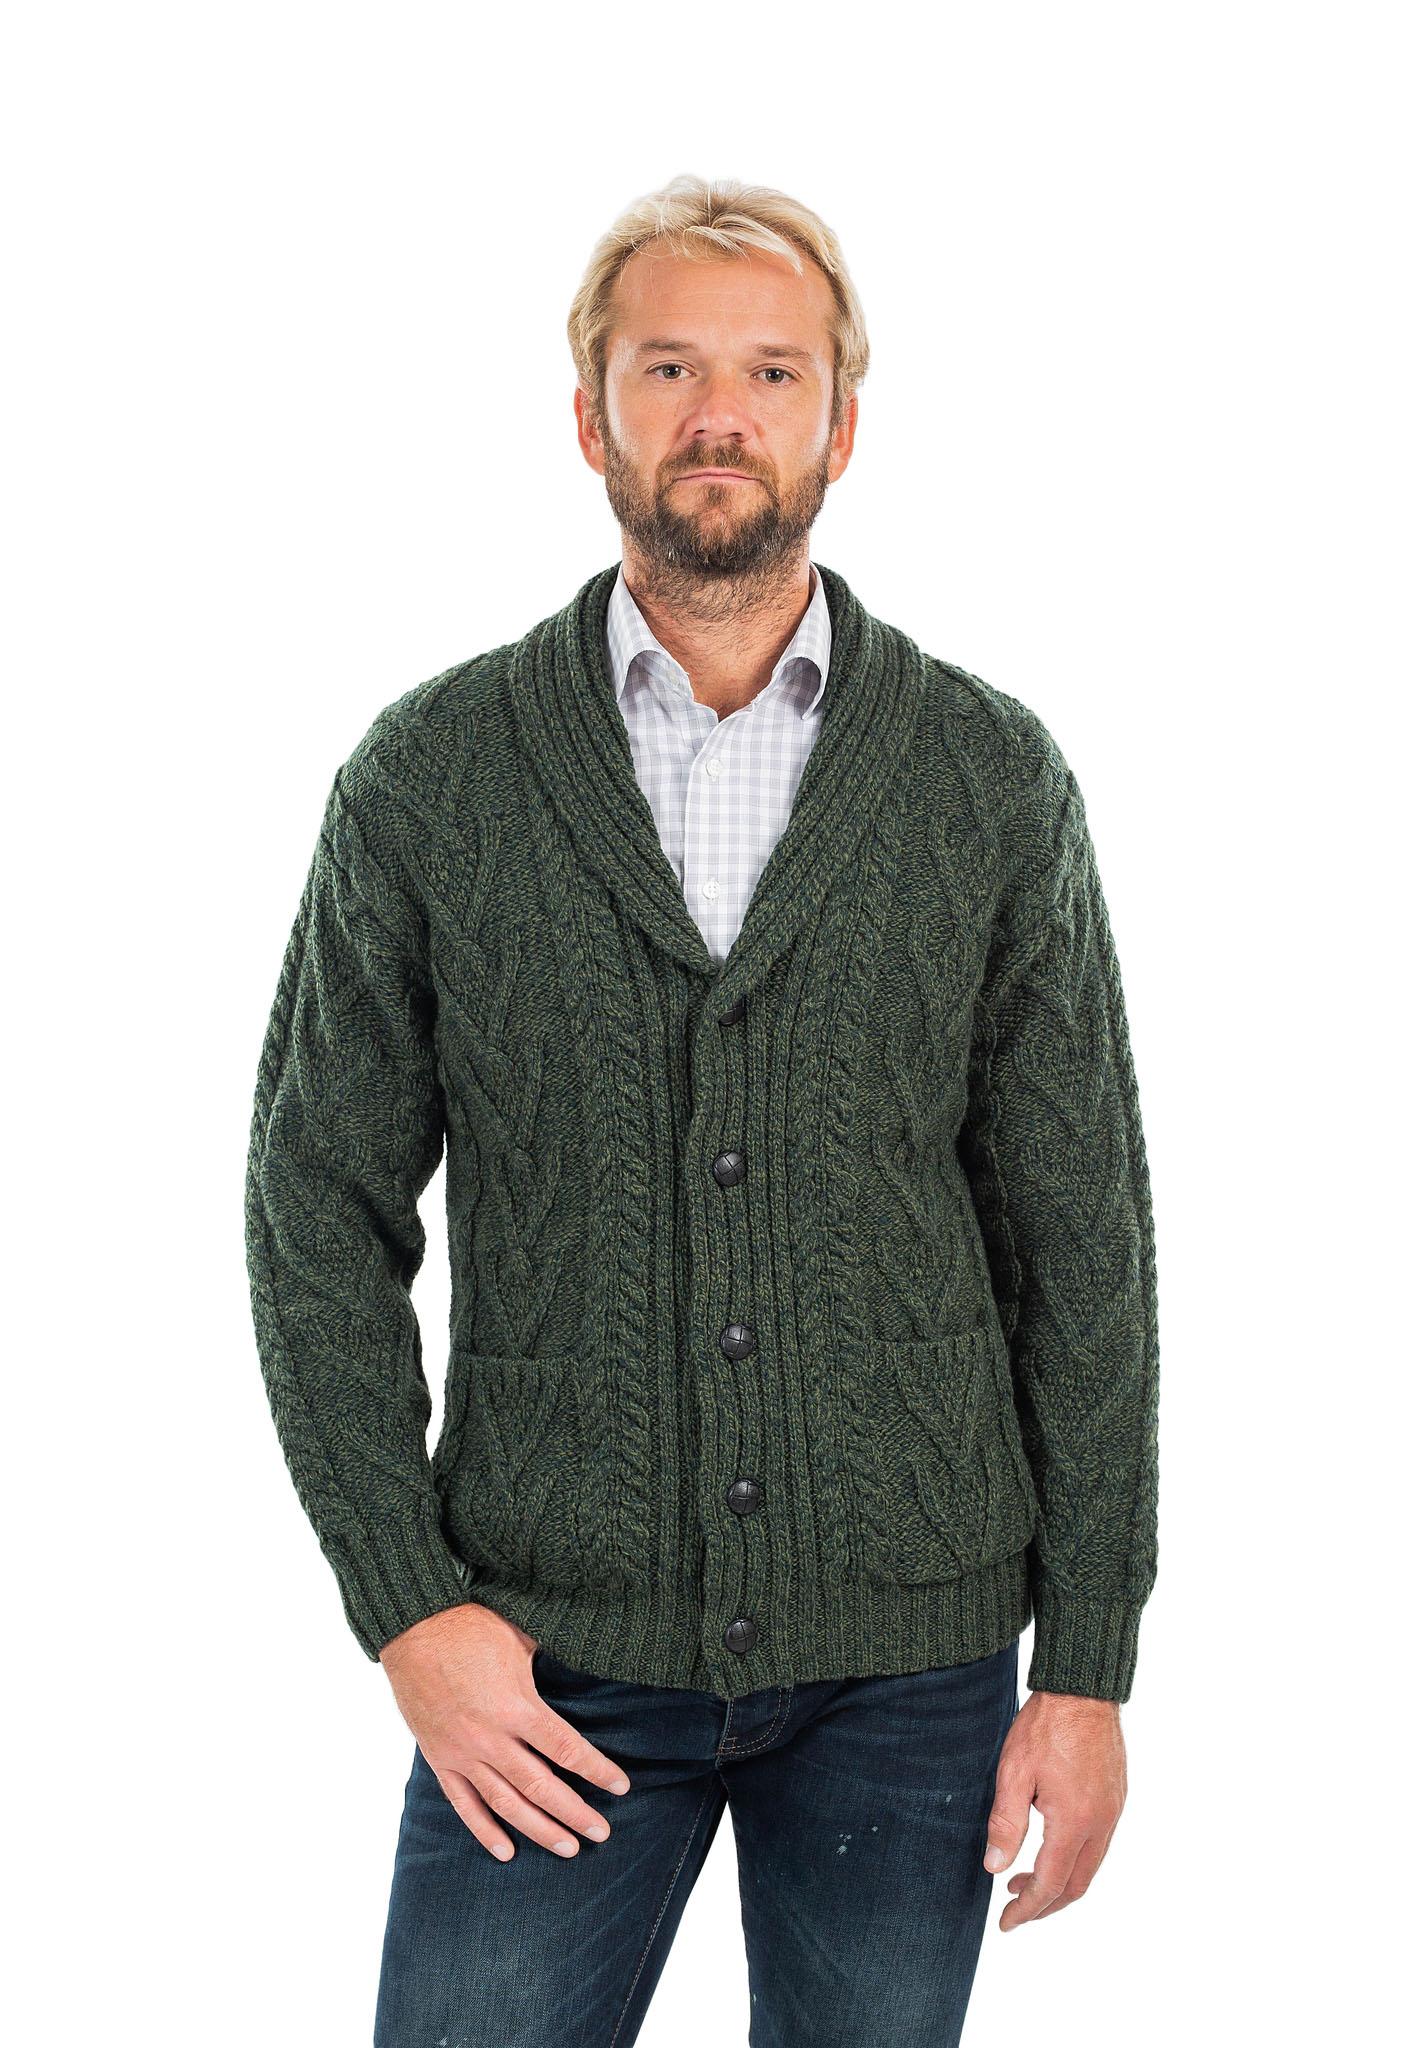 SAOL-Mens-Irish-Merino-Wool-Cardigan-Shawl-Collar-Front-Pockets-Aran-Cable-Knit thumbnail 14